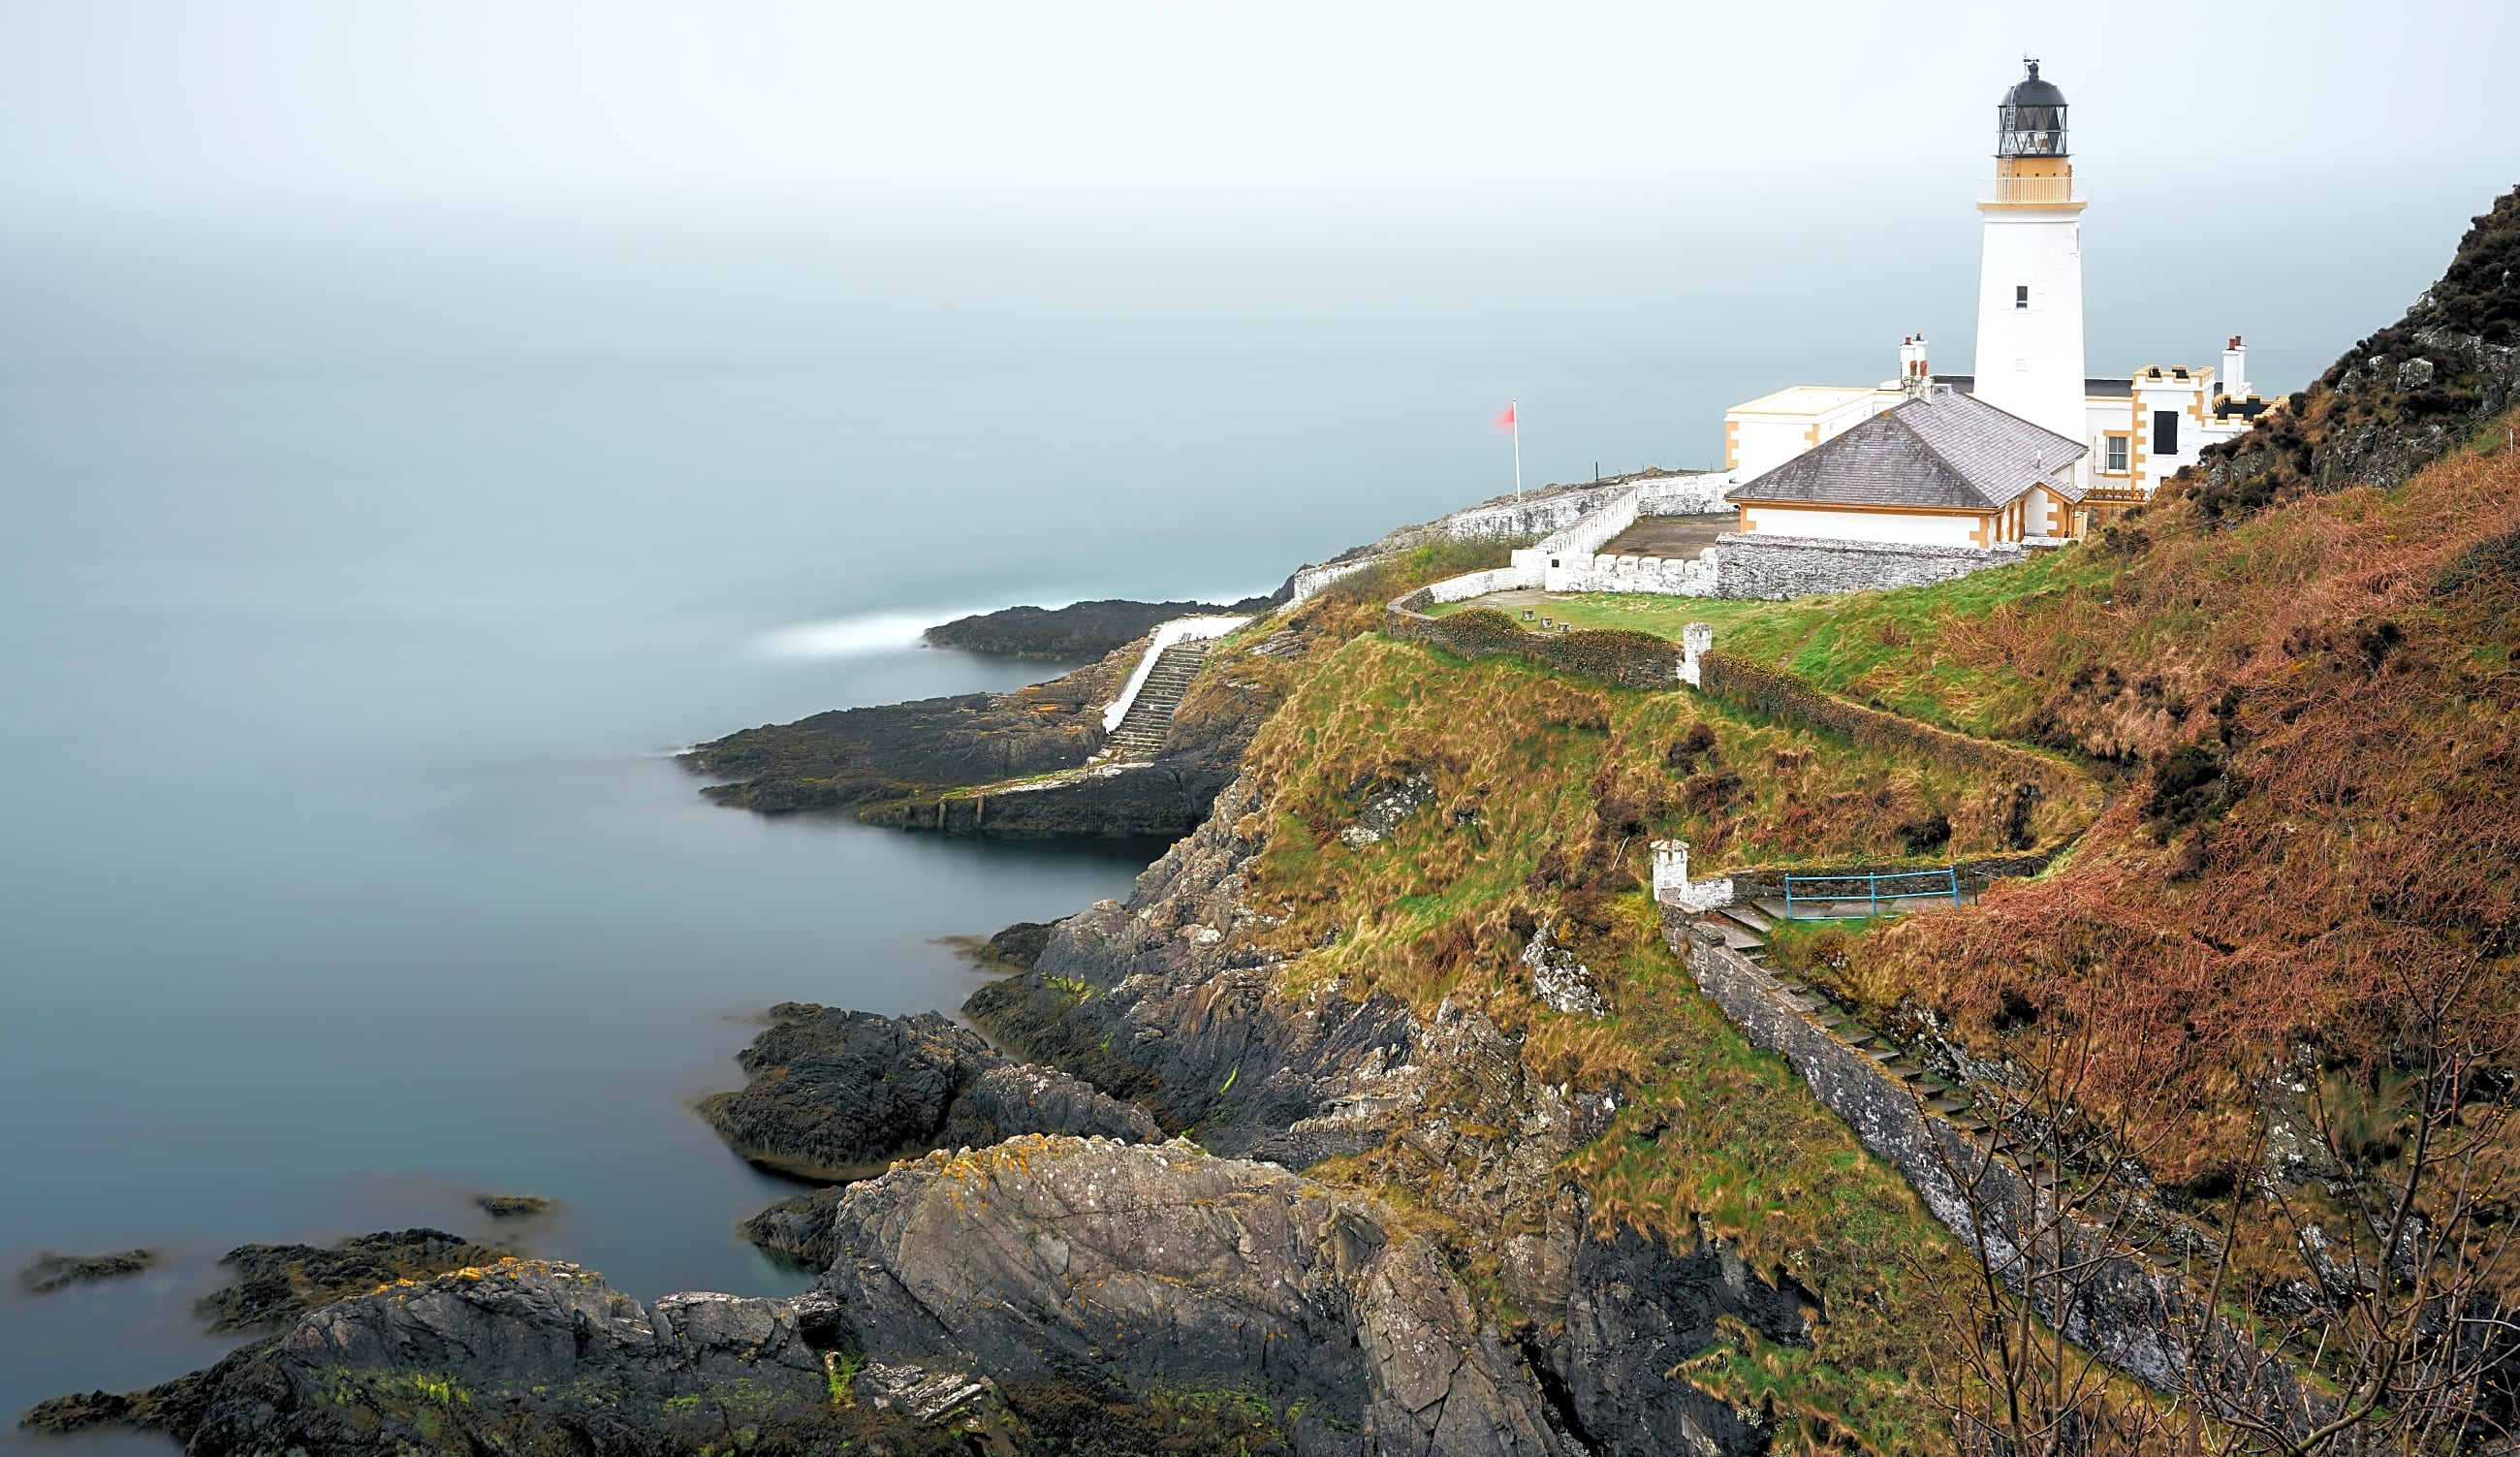 lighthouse on a rocky cliff on overcast, slightly foggy day